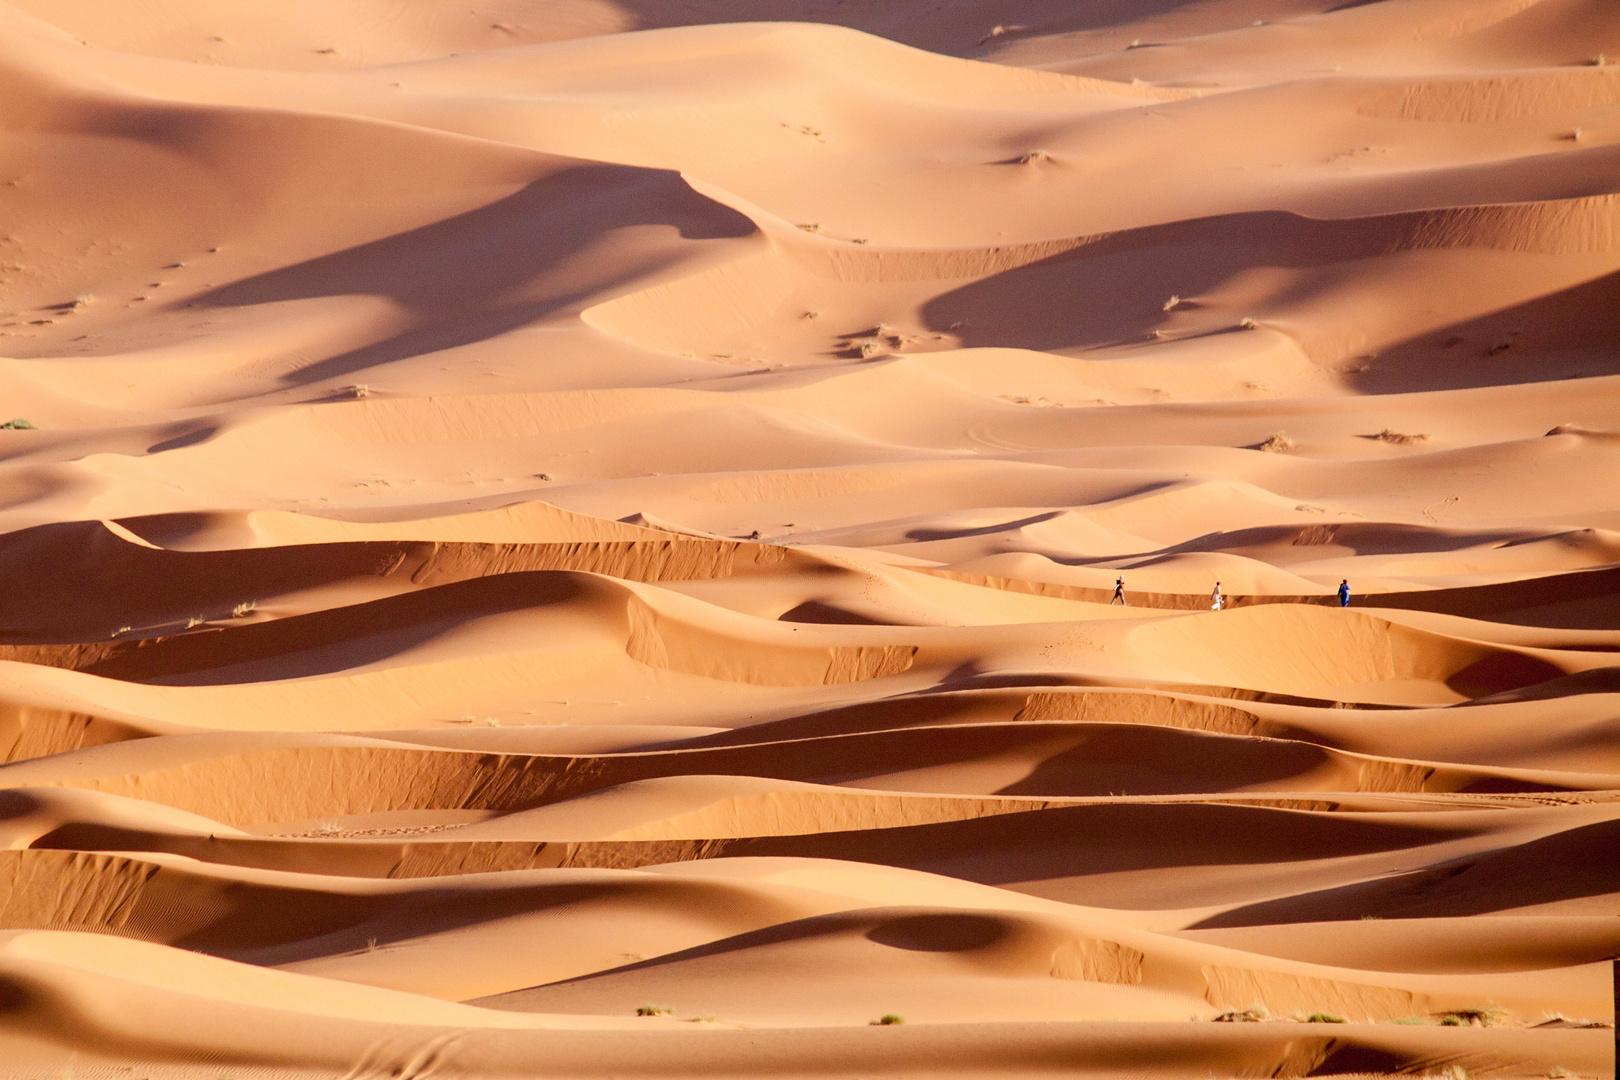 Marokko; Fes-Erfoud (Erg Chebbi) 2